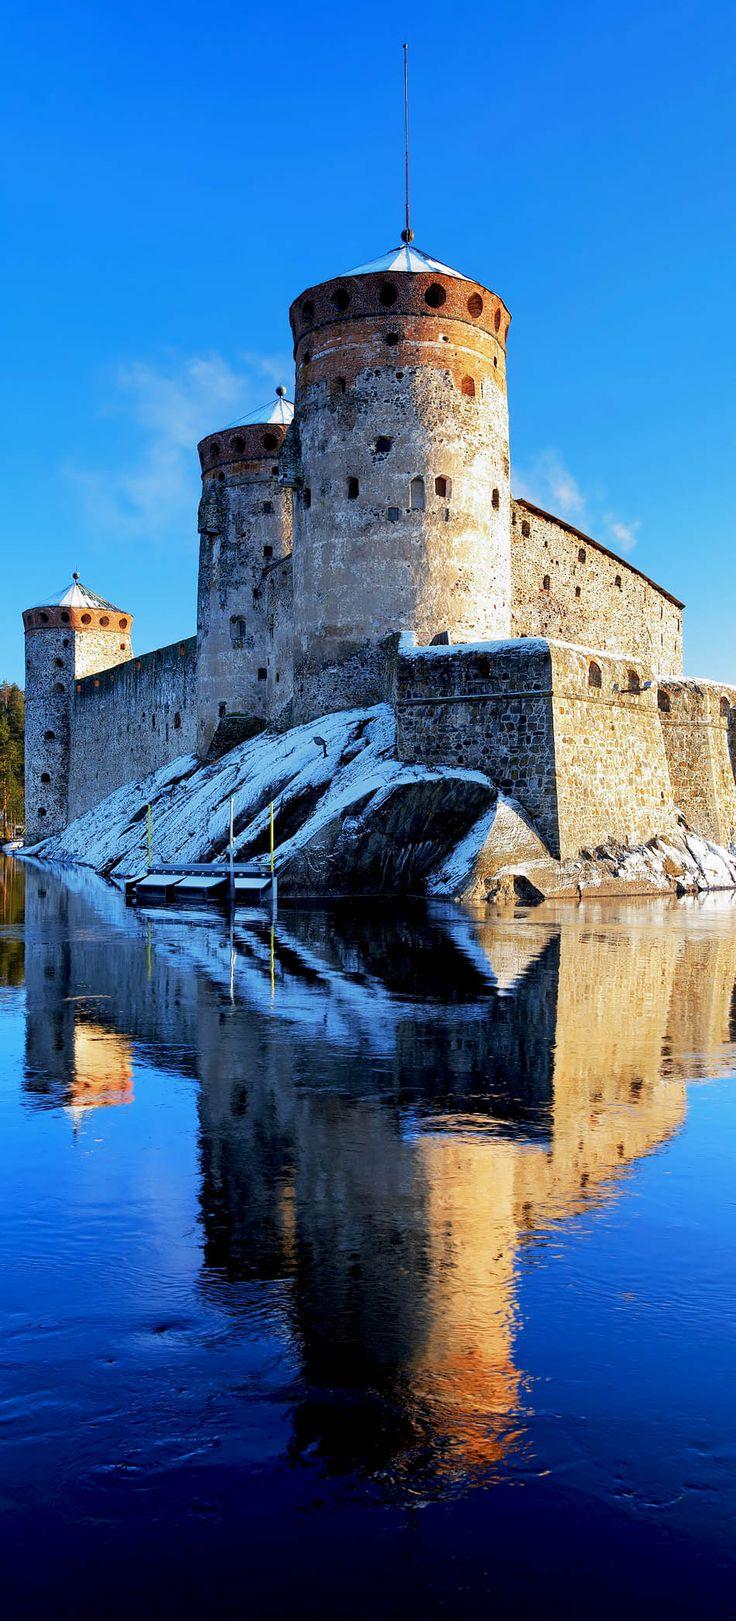 Castle Olavinlinna (Olofsborg) in winter, Savonlinna, Finland | The 20 Most Stunning Fairytale Castles in Winter